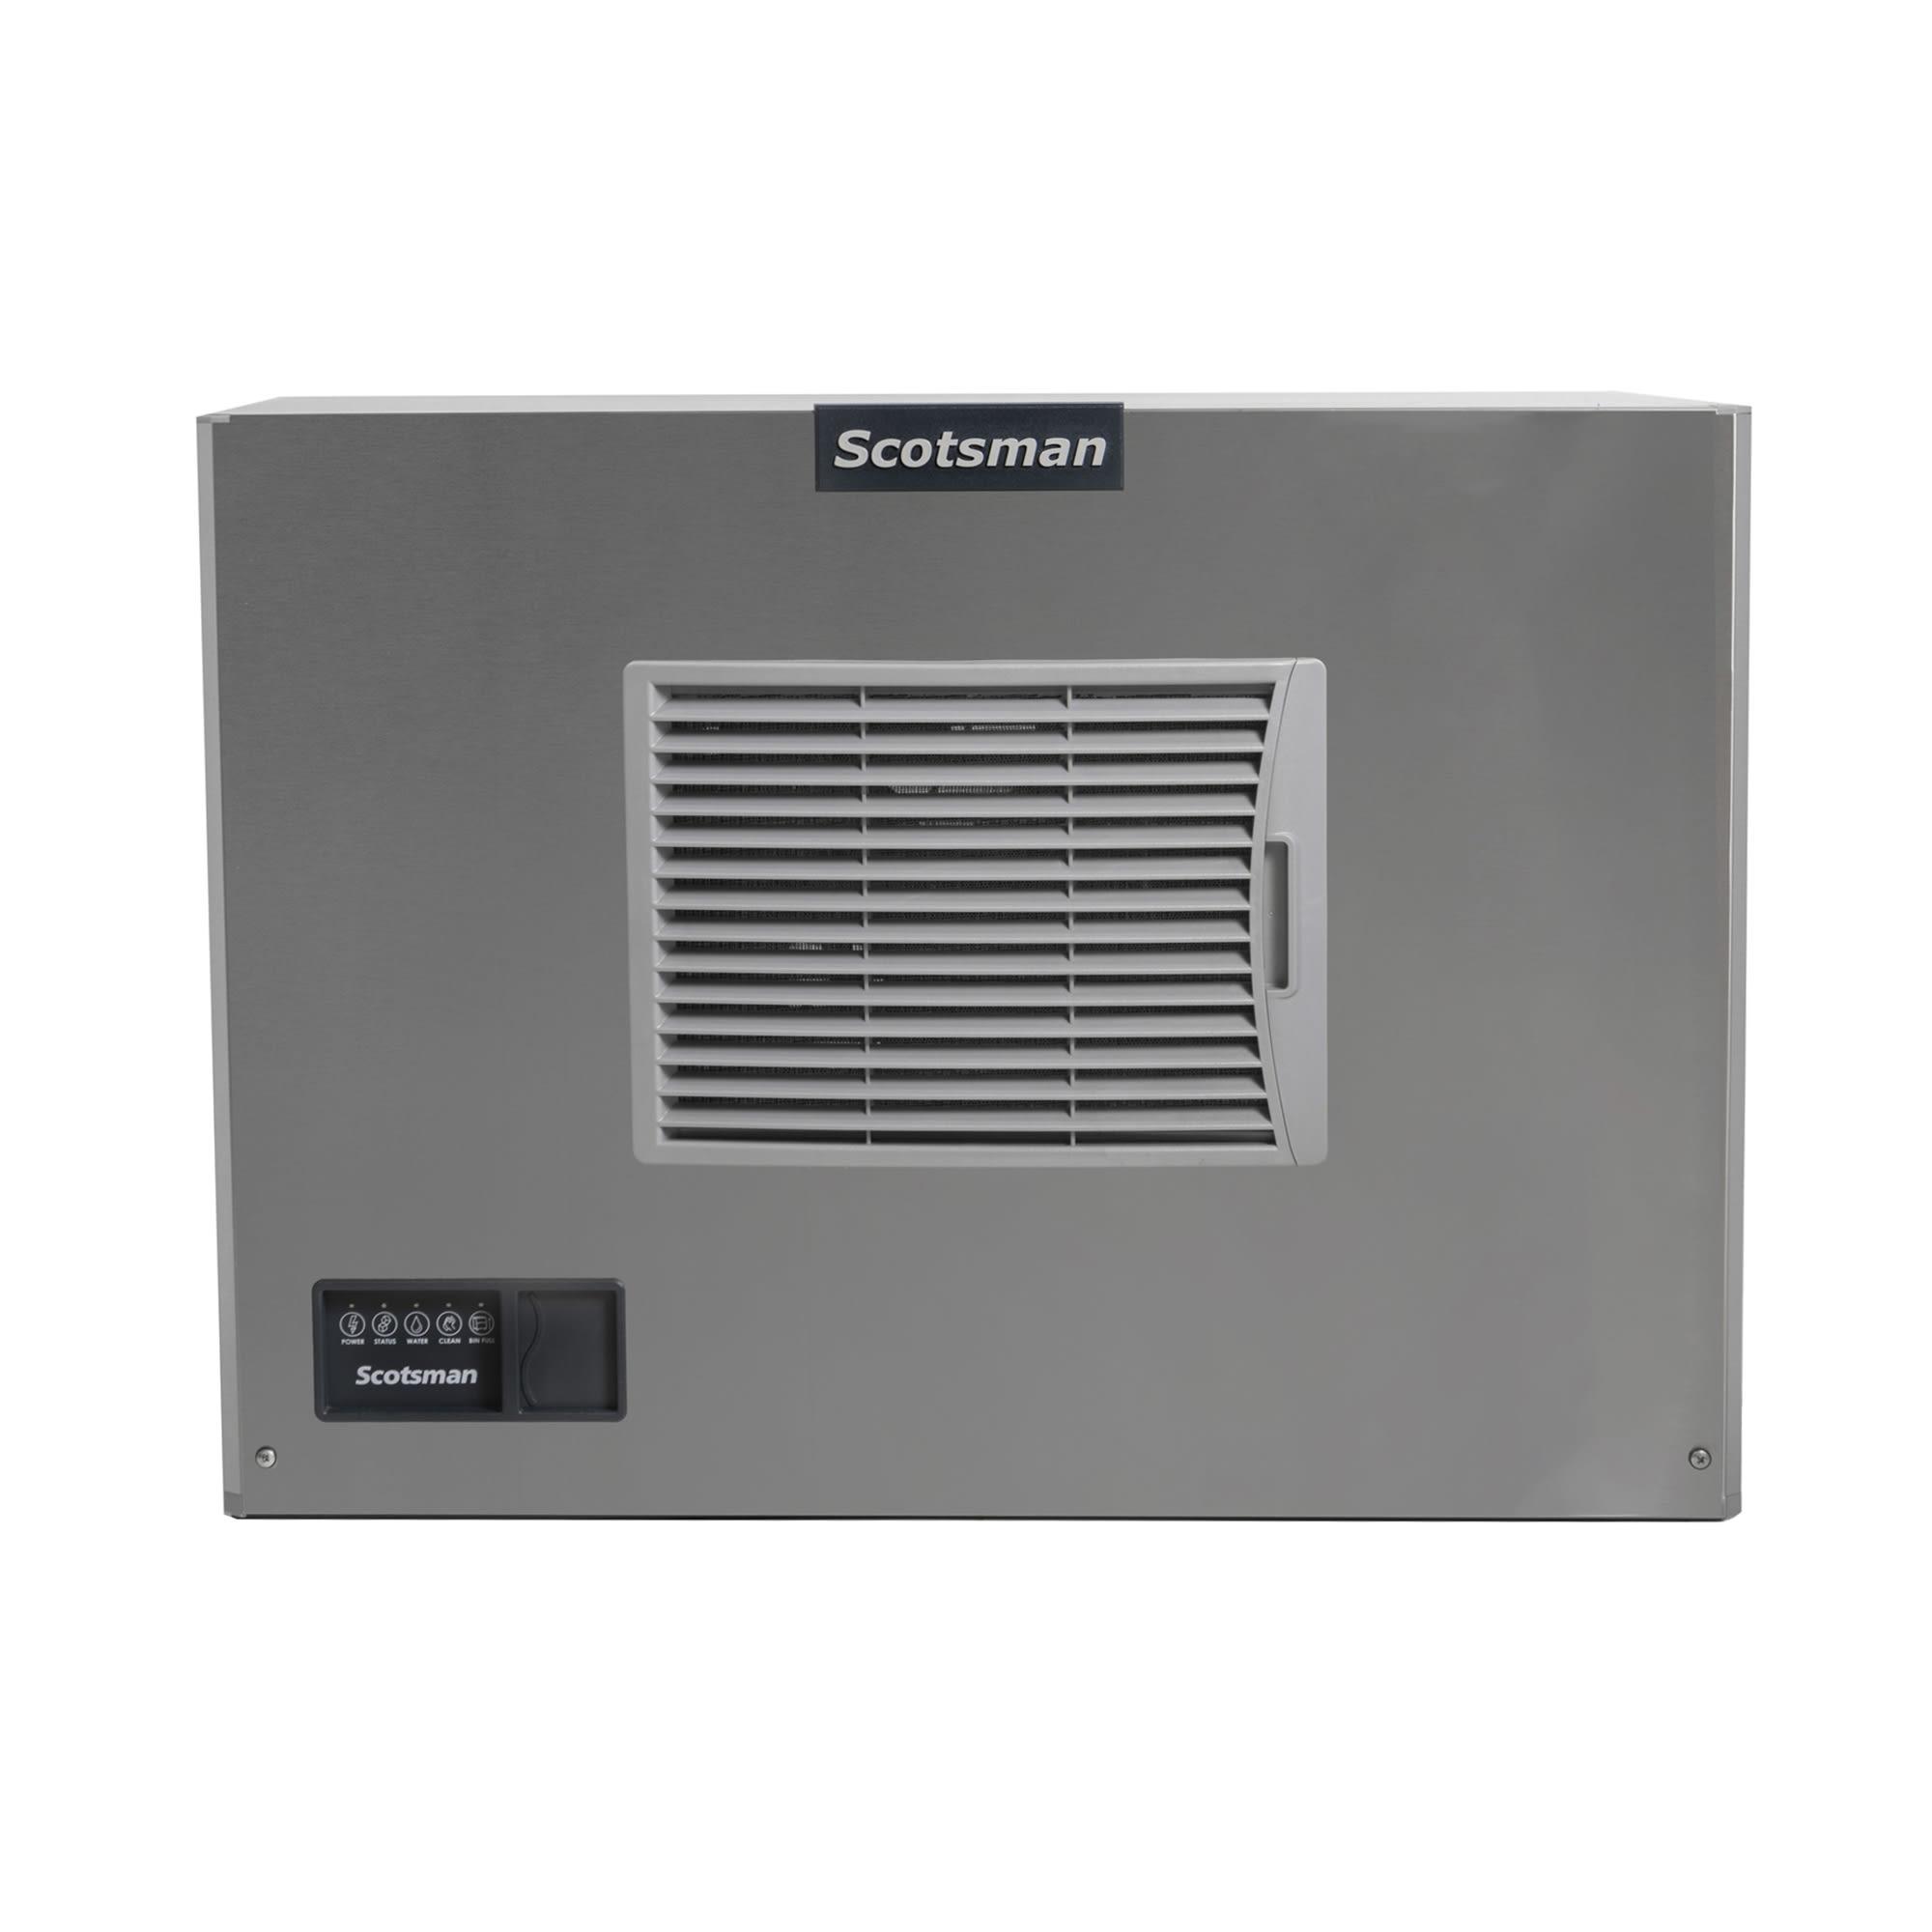 "Scotsman C0630MA-32 30"" Prodigy Plus® Full Cube Ice Machine Head - 776 lb/day, Air Cooled, 208 230v/1ph"